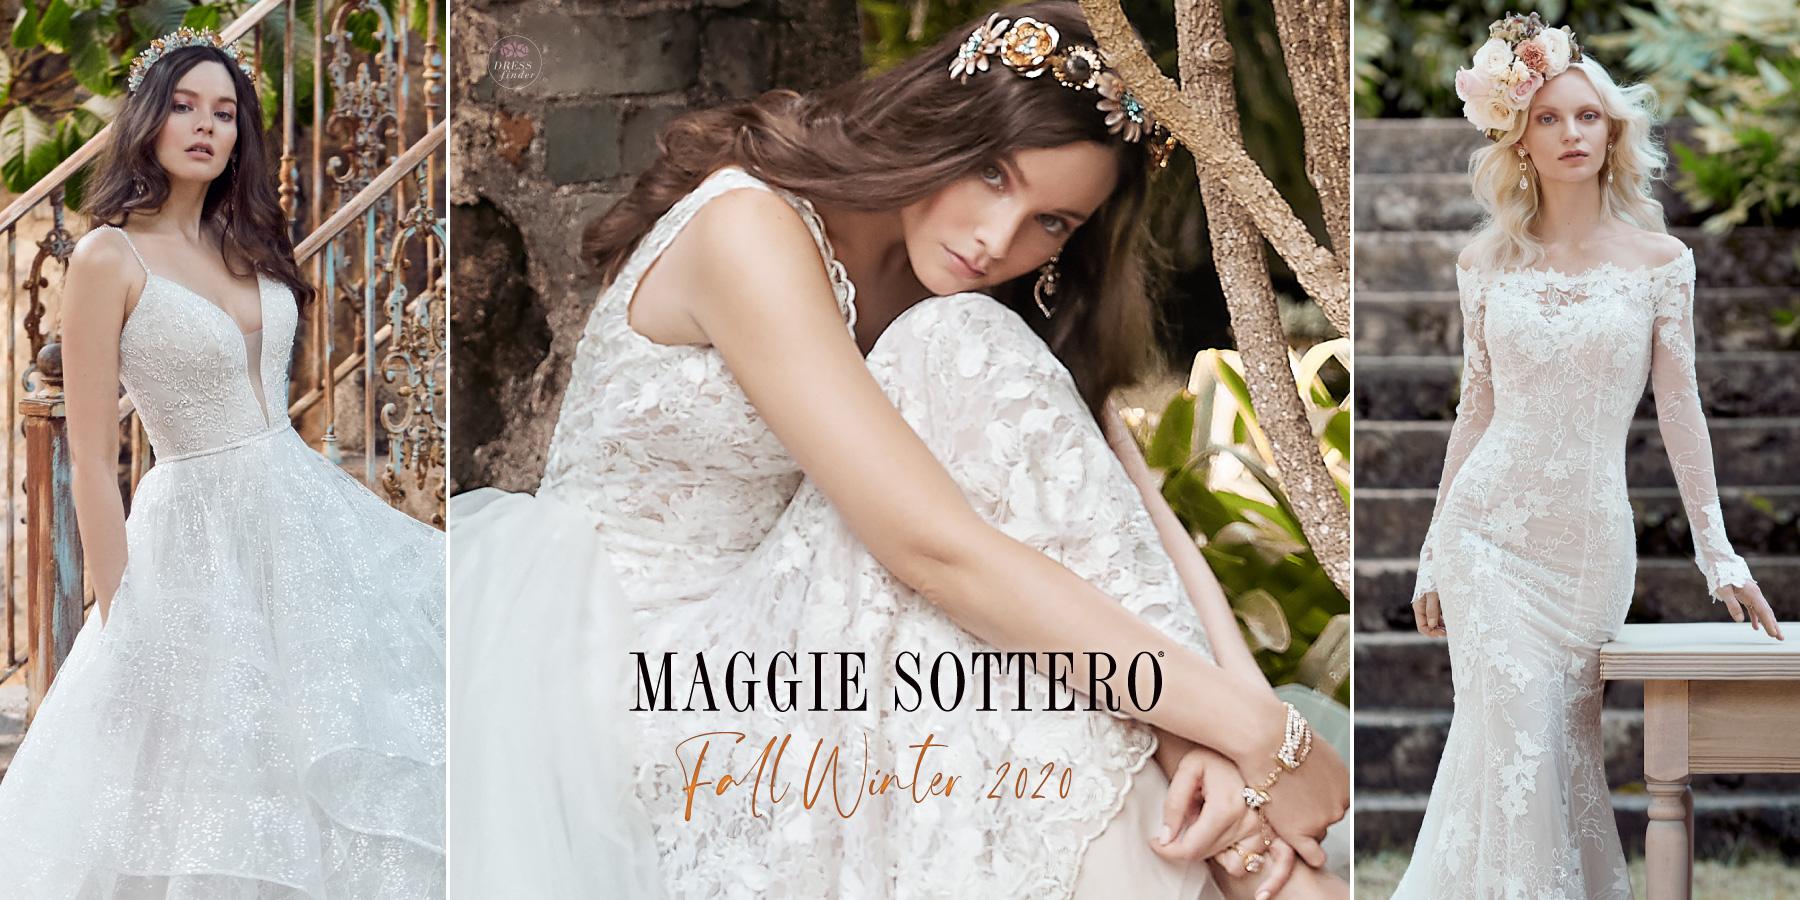 Maggie Sottero Wedding Dresses In Canada The Dressfinder